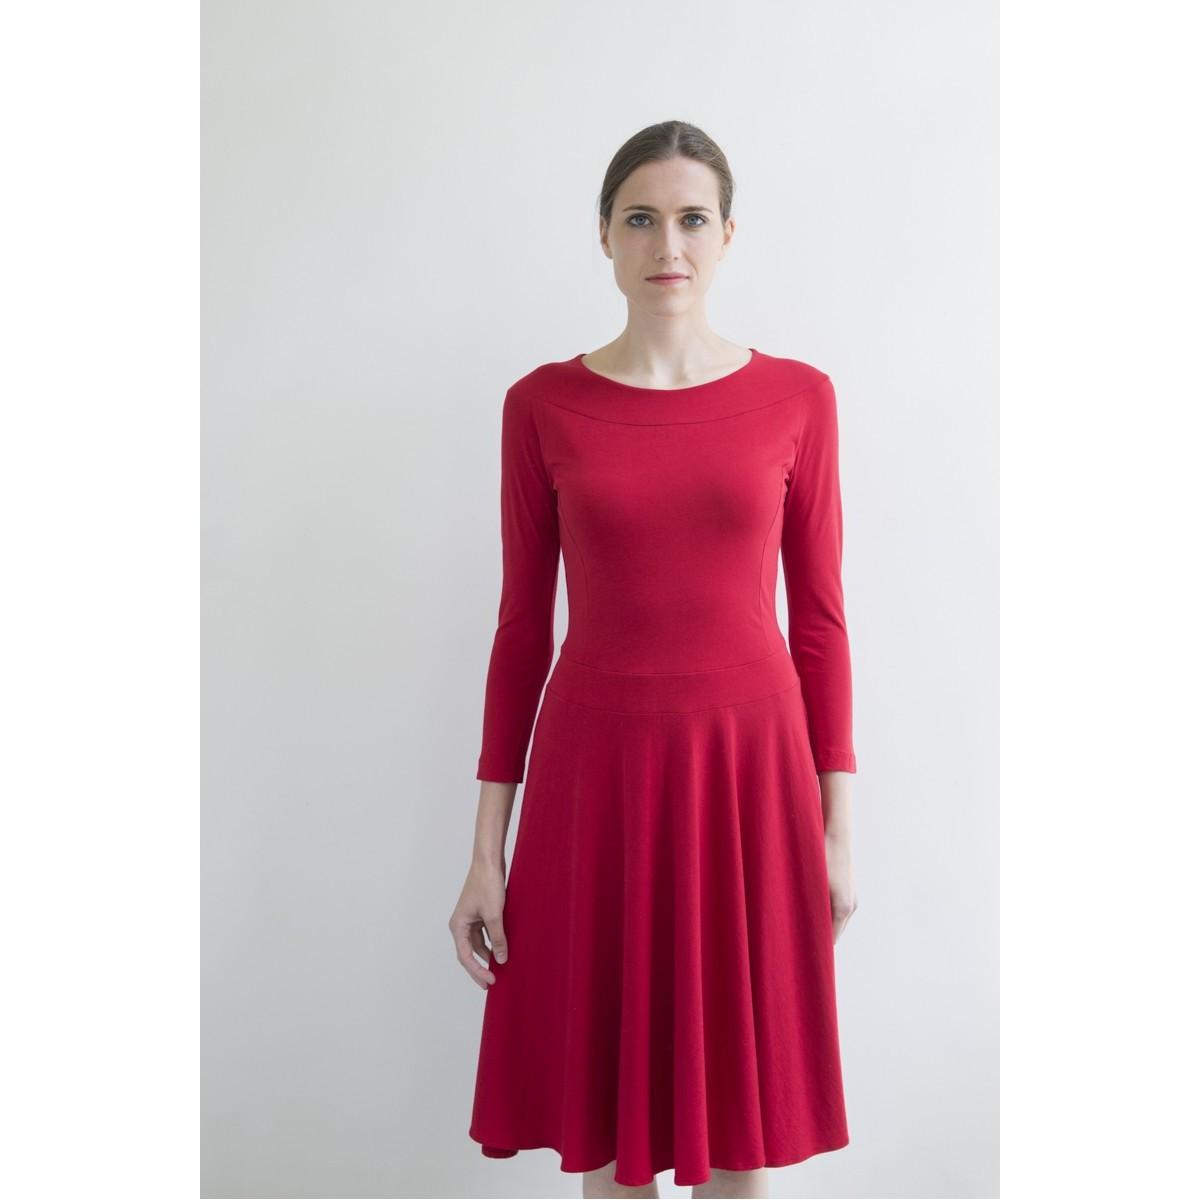 RiannedeWitte | Floras jurk from Rianne de Witte